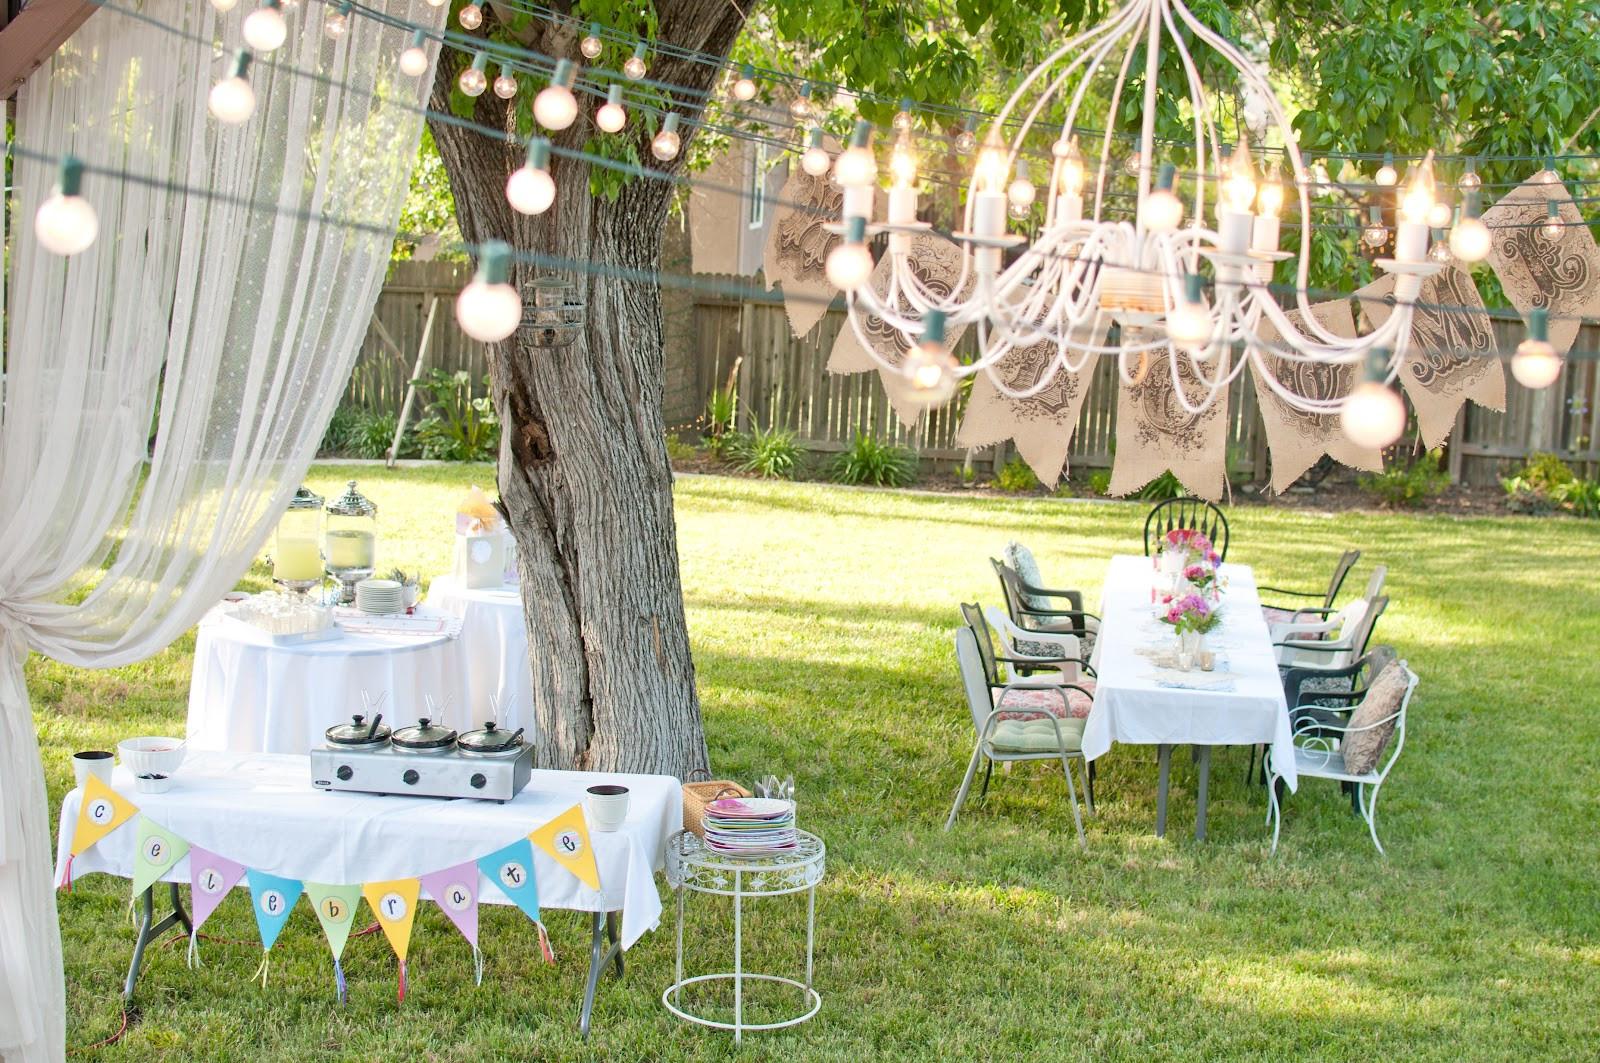 Birthday Party Ideas Backyard  Domestic Fashionista Summer Backyard Birthday Party